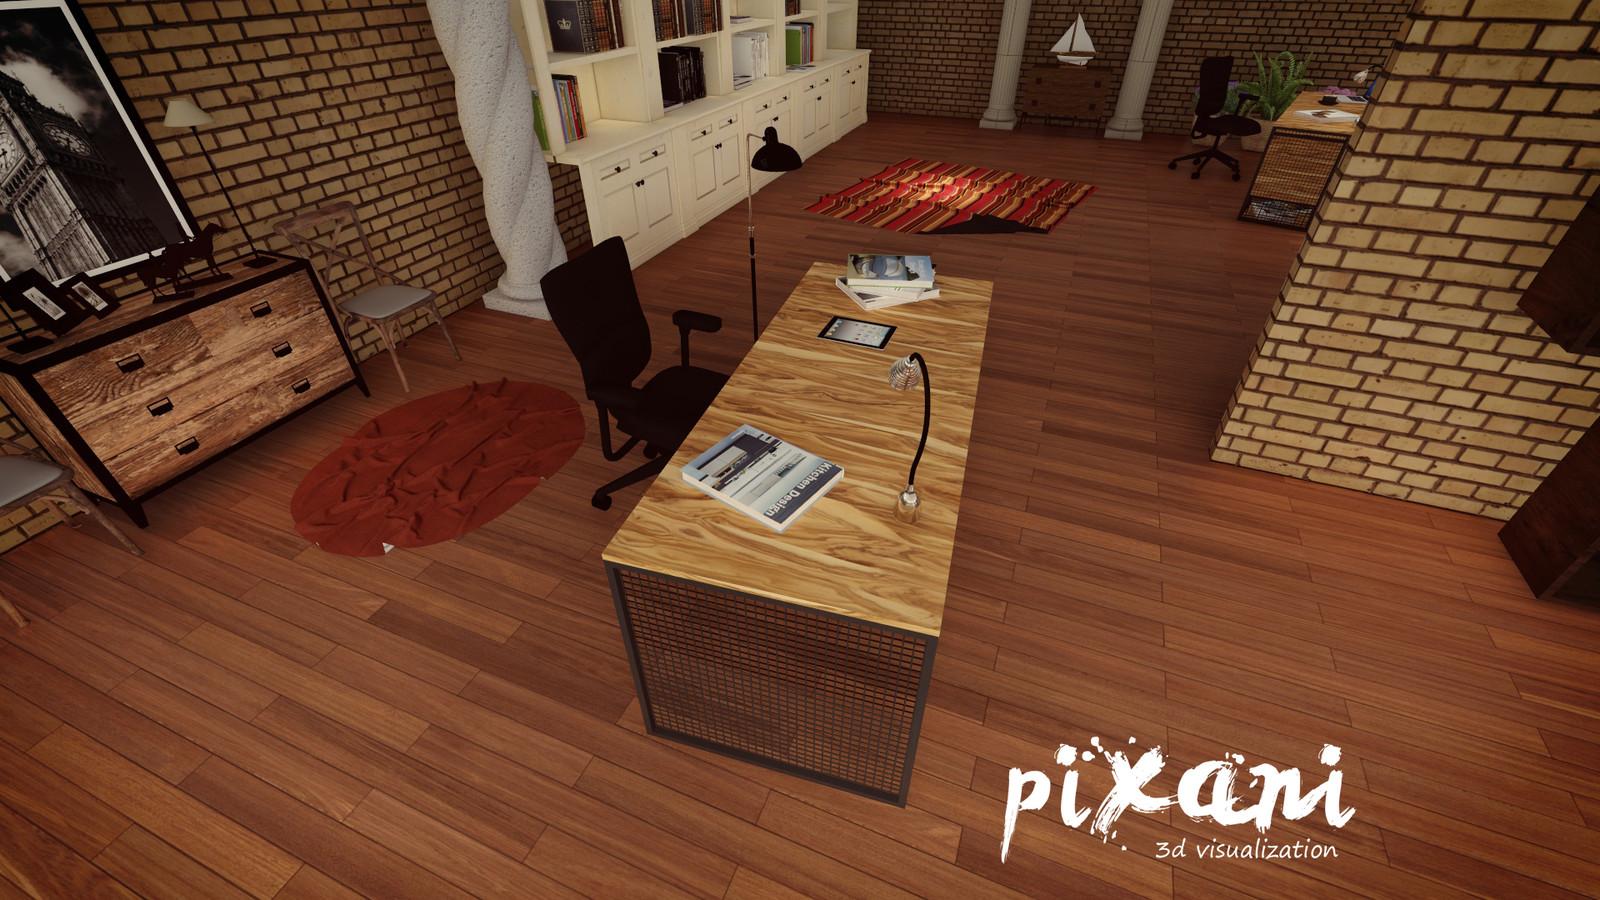 T-DESK gx      T-MASA gx  Single desk usage